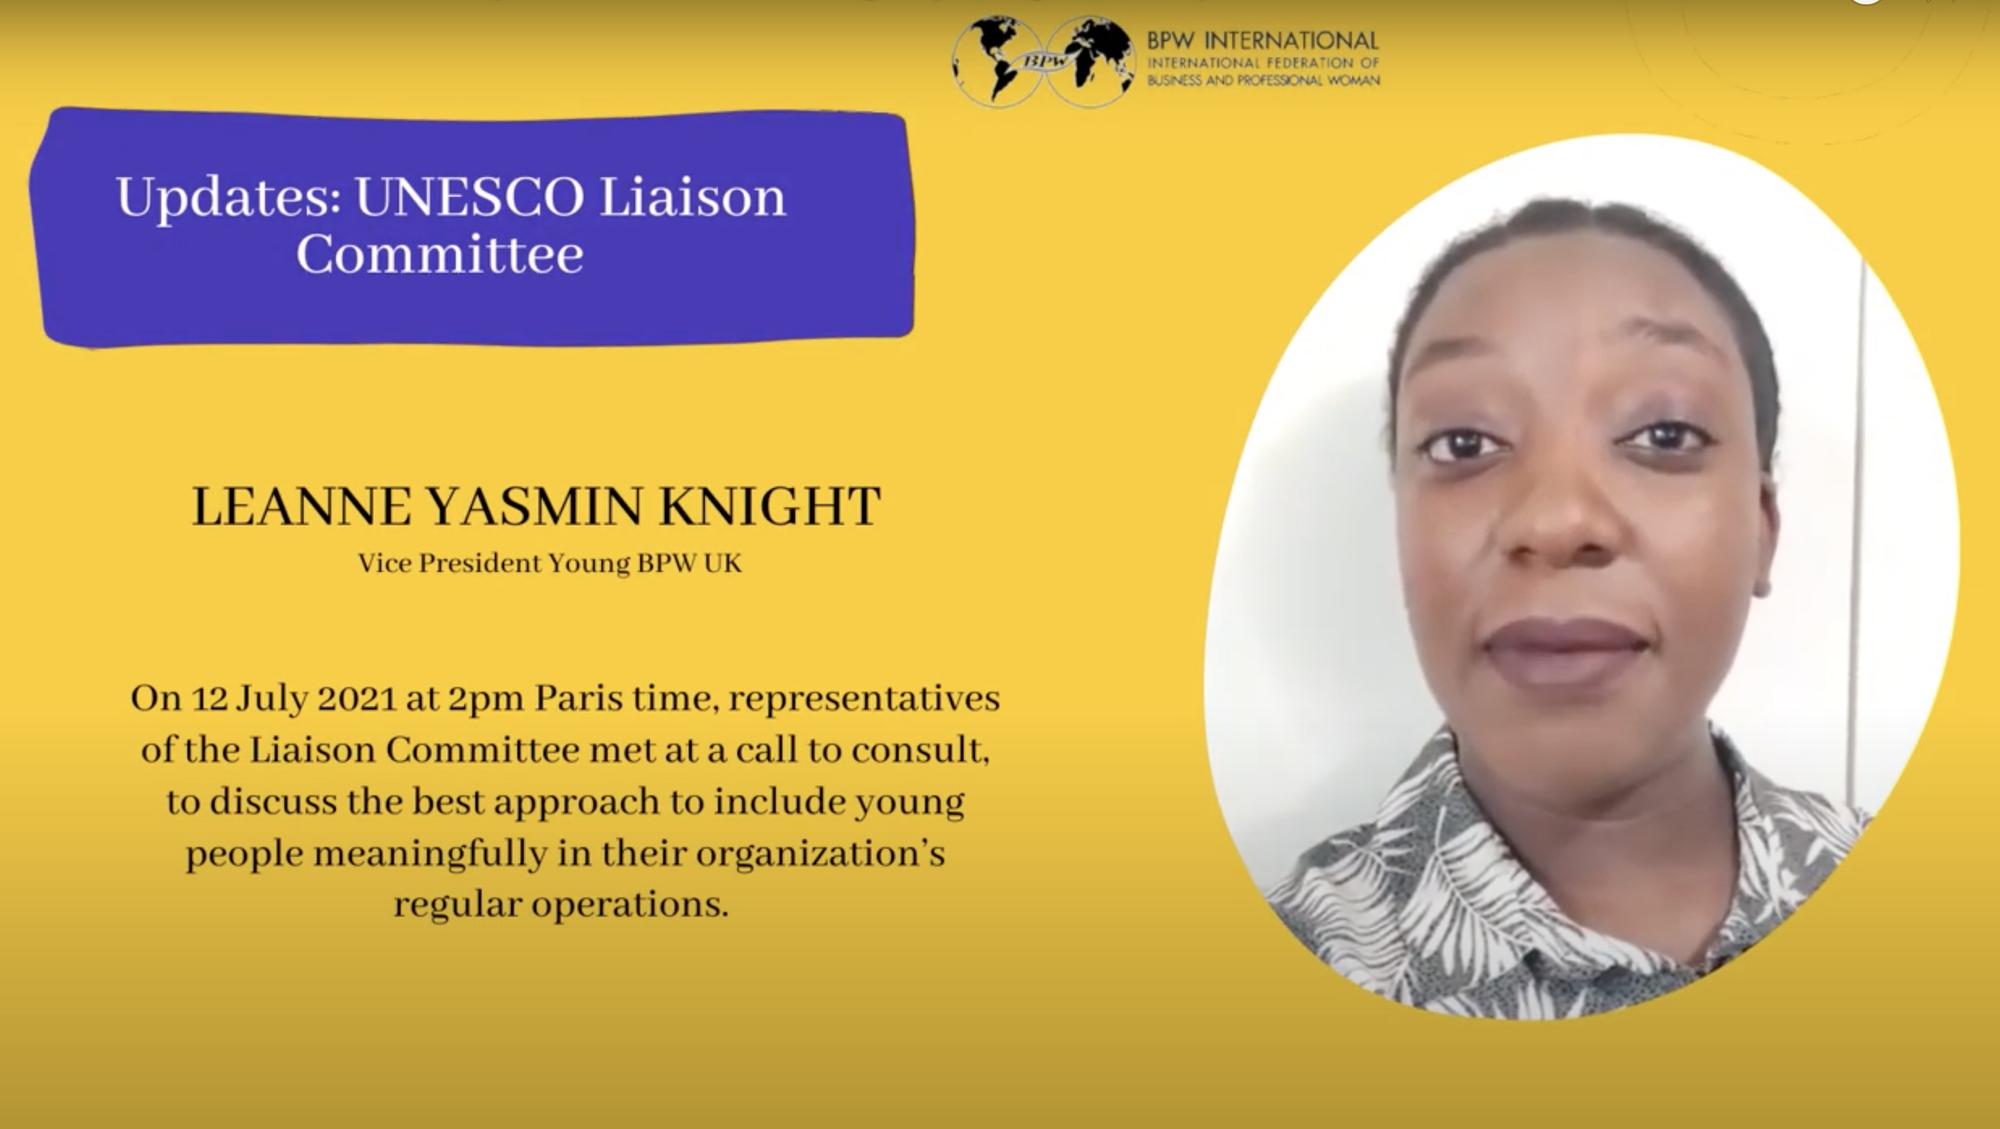 Updates: UNESCO Liaison Committee